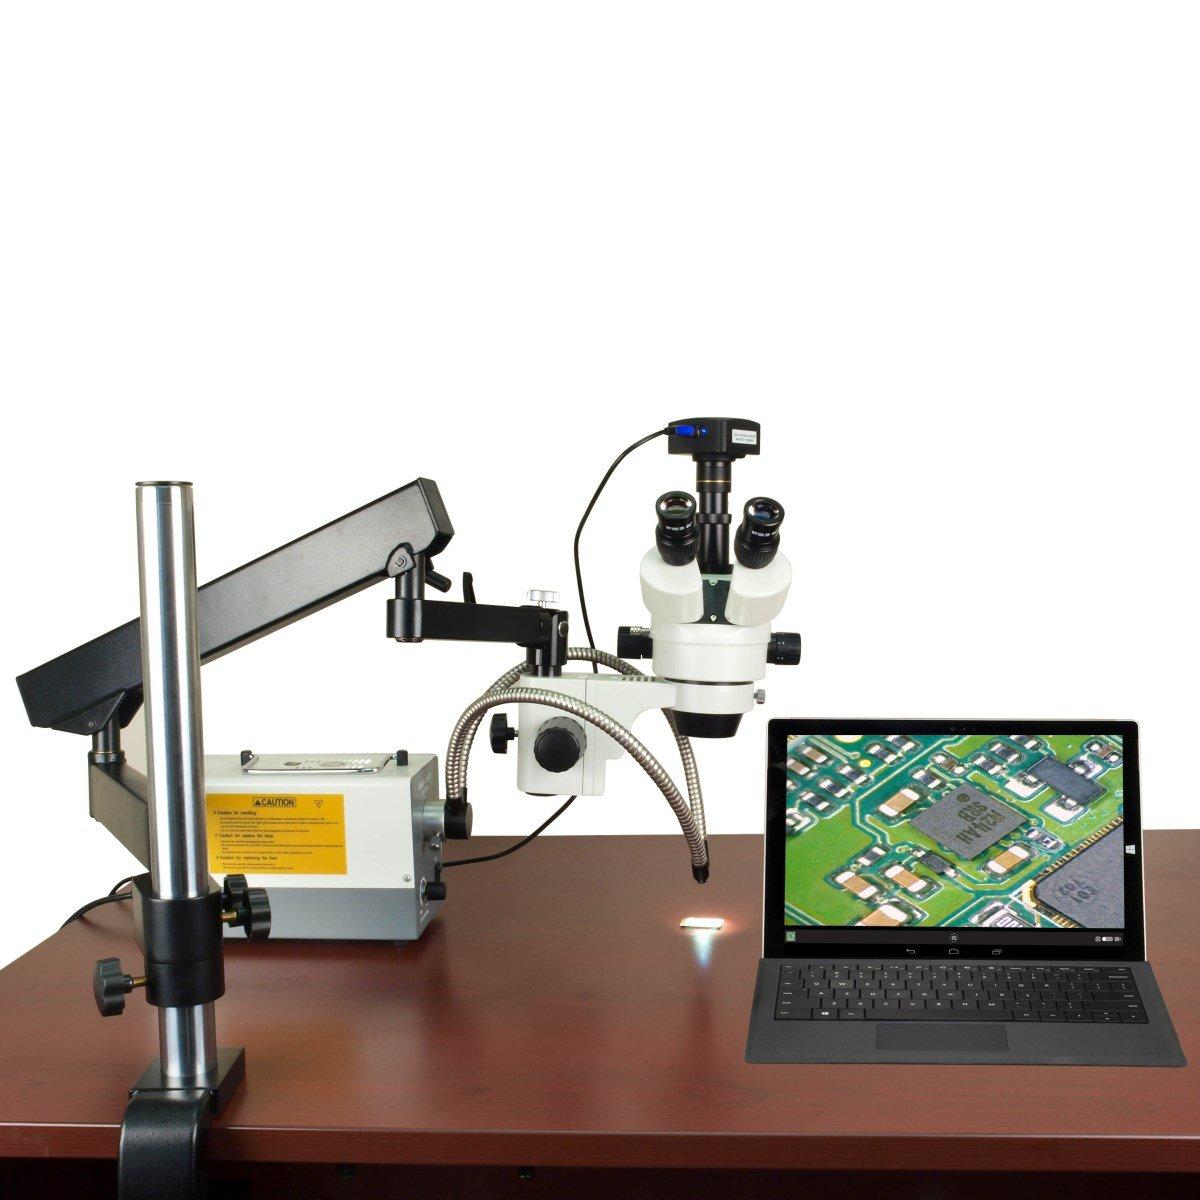 OMAX 150Wリングおよびデュアルファイバーライトと関節アームの2.1倍-270X 720 WiFiのズーム実体顕微鏡   B014V6OYJG